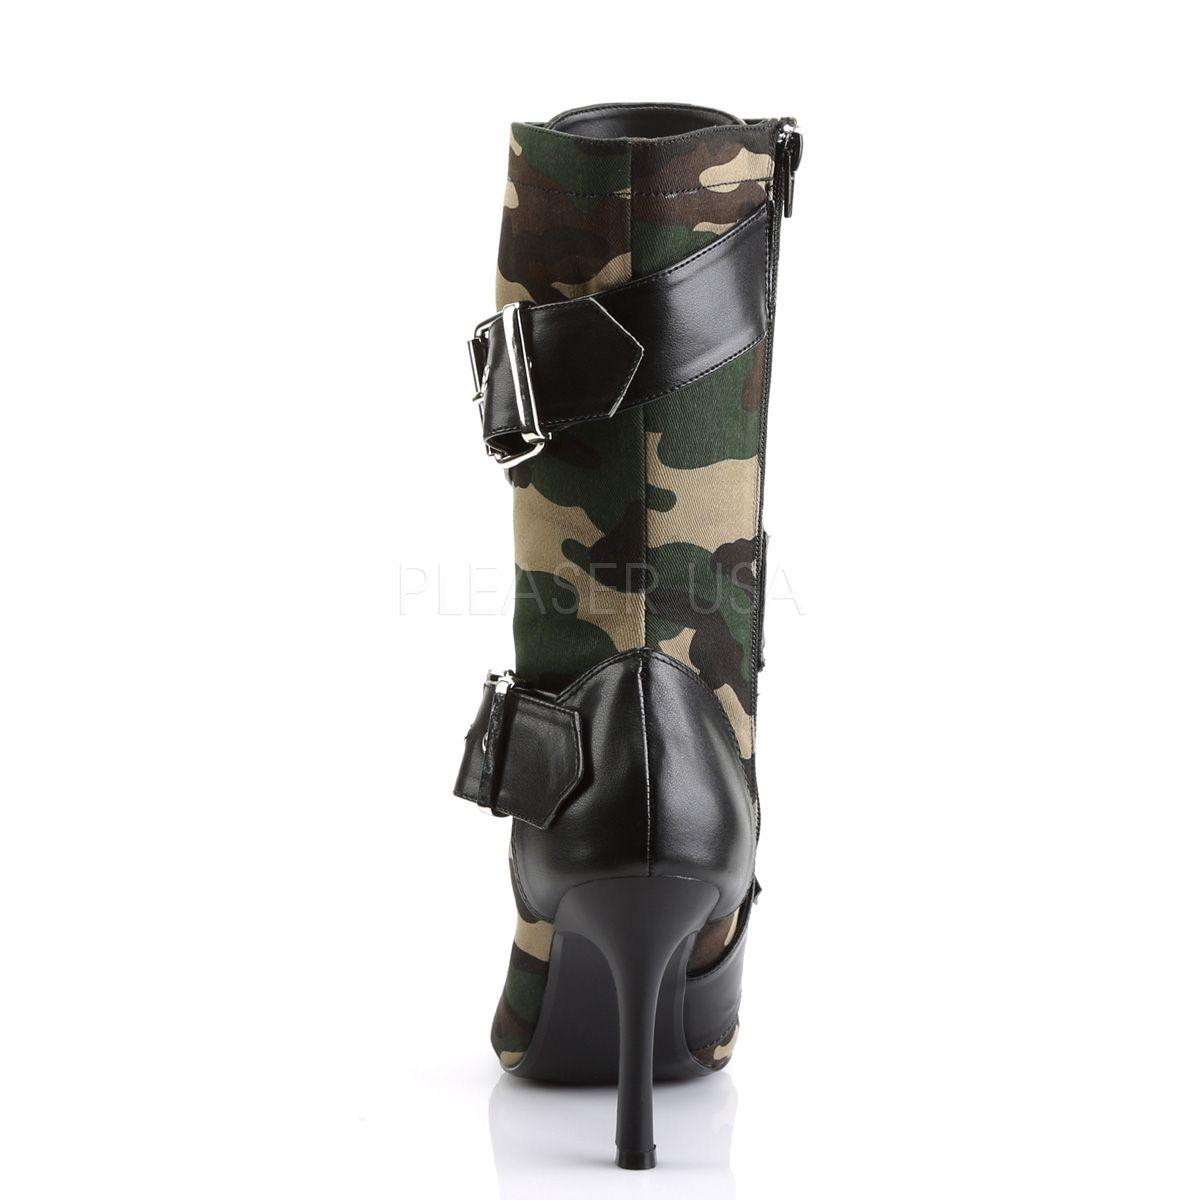 Bota Militant 128 Militar Cano Curto - Funtasma (encomenda)